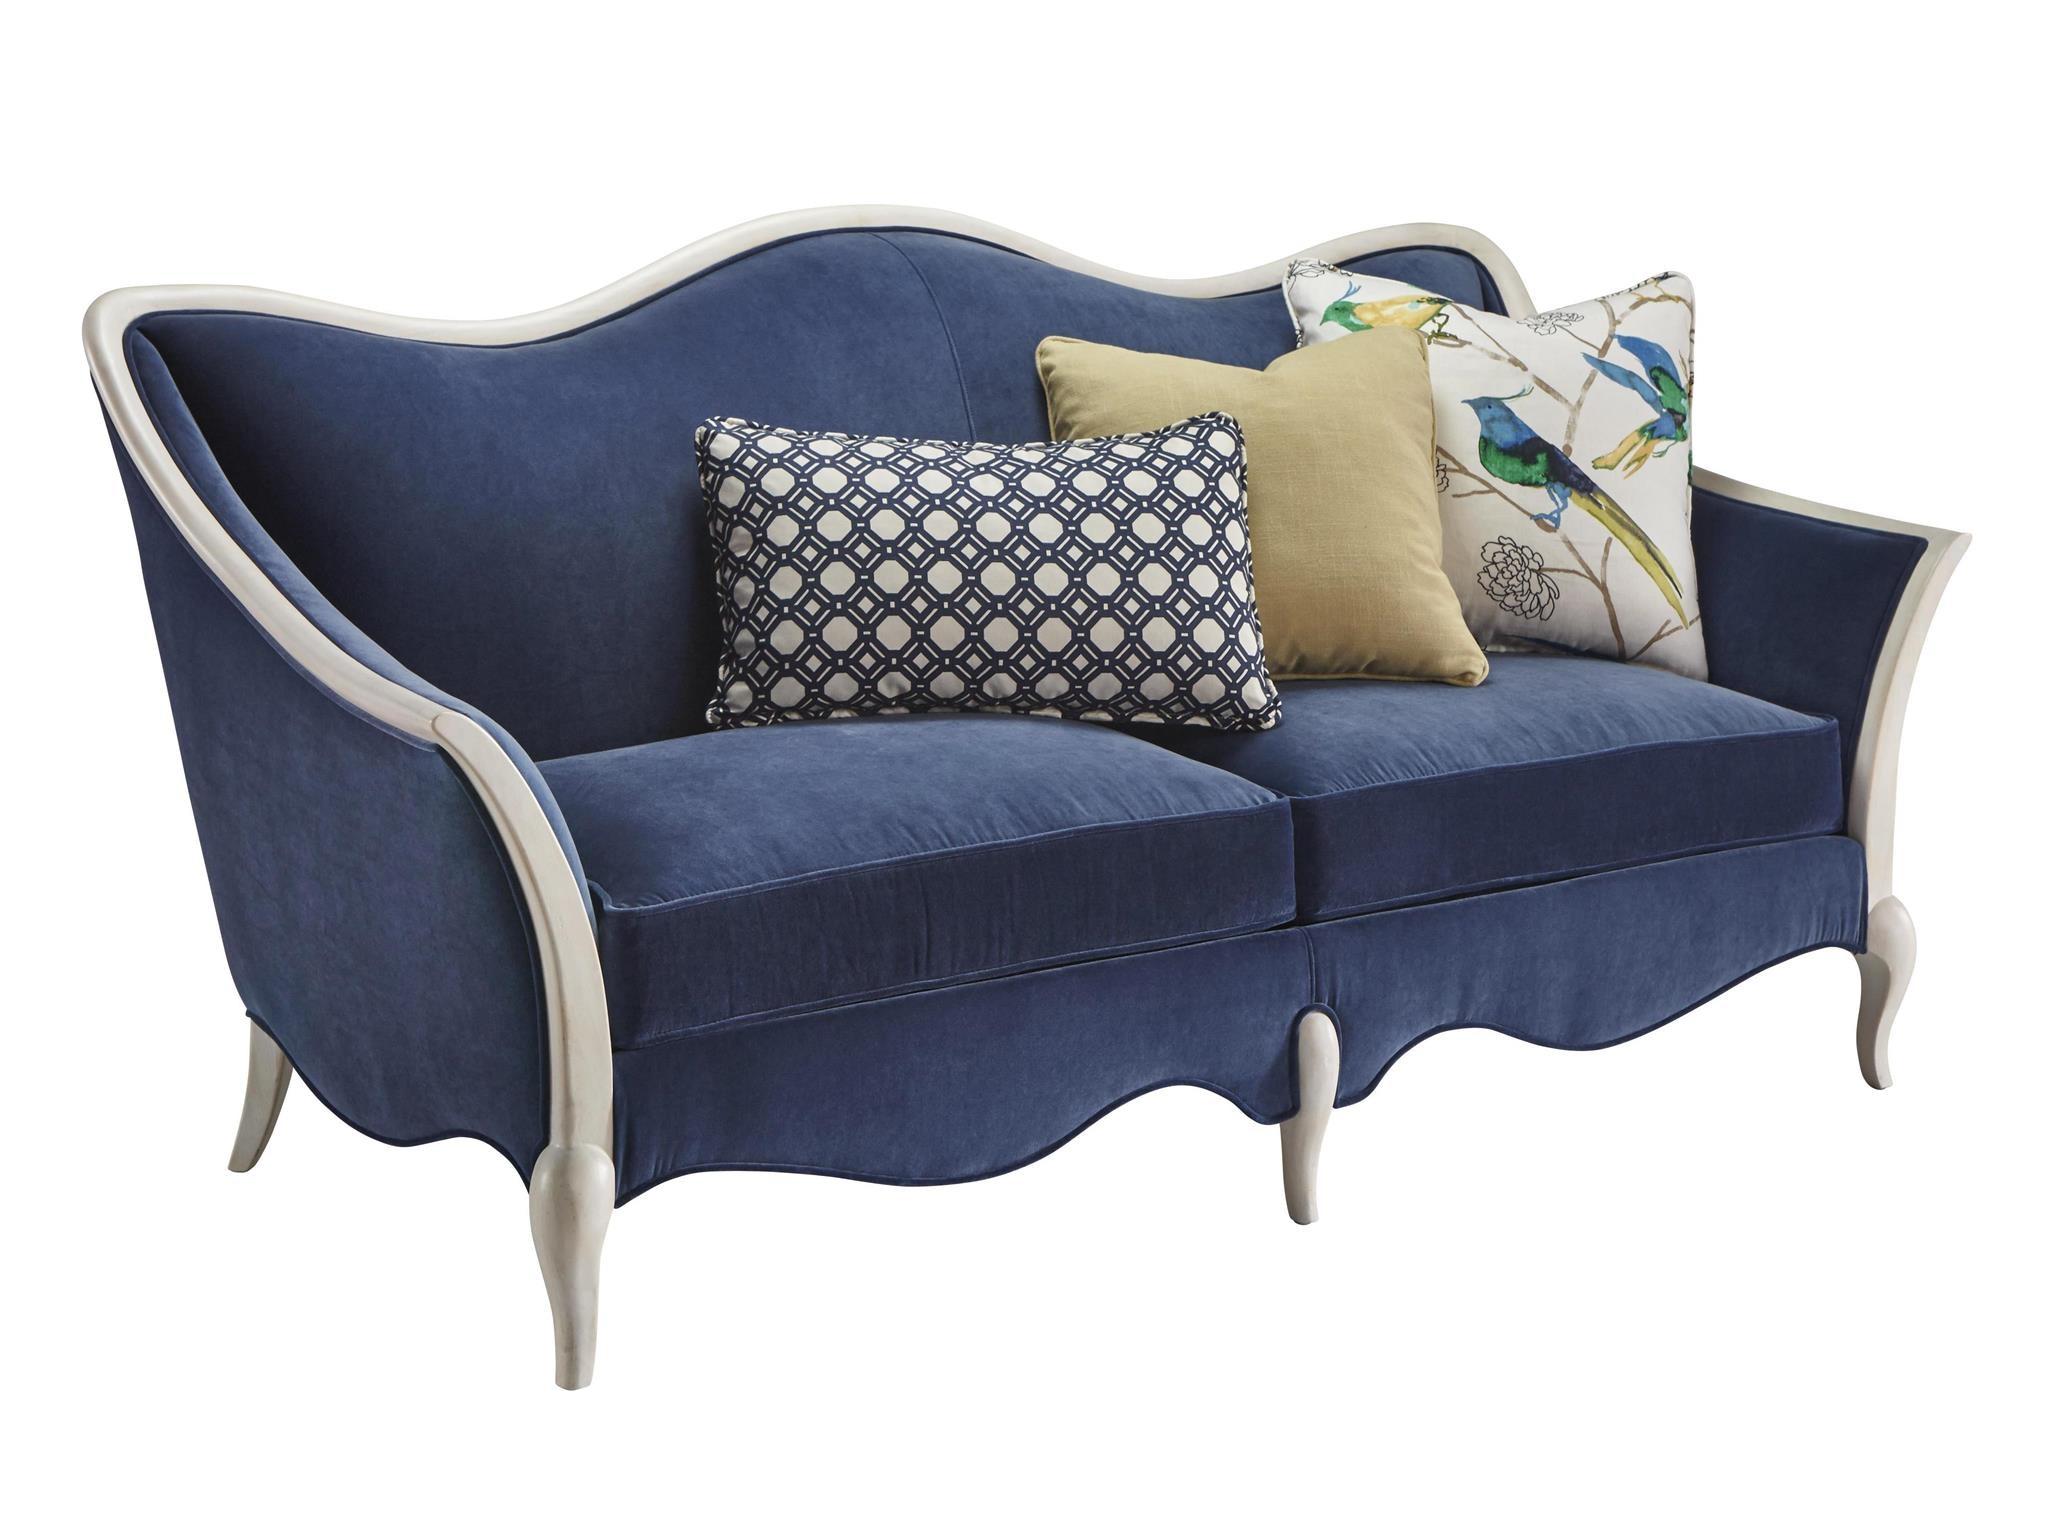 Merveilleux Fine Furniture Design Philomena Sofa 5811 01